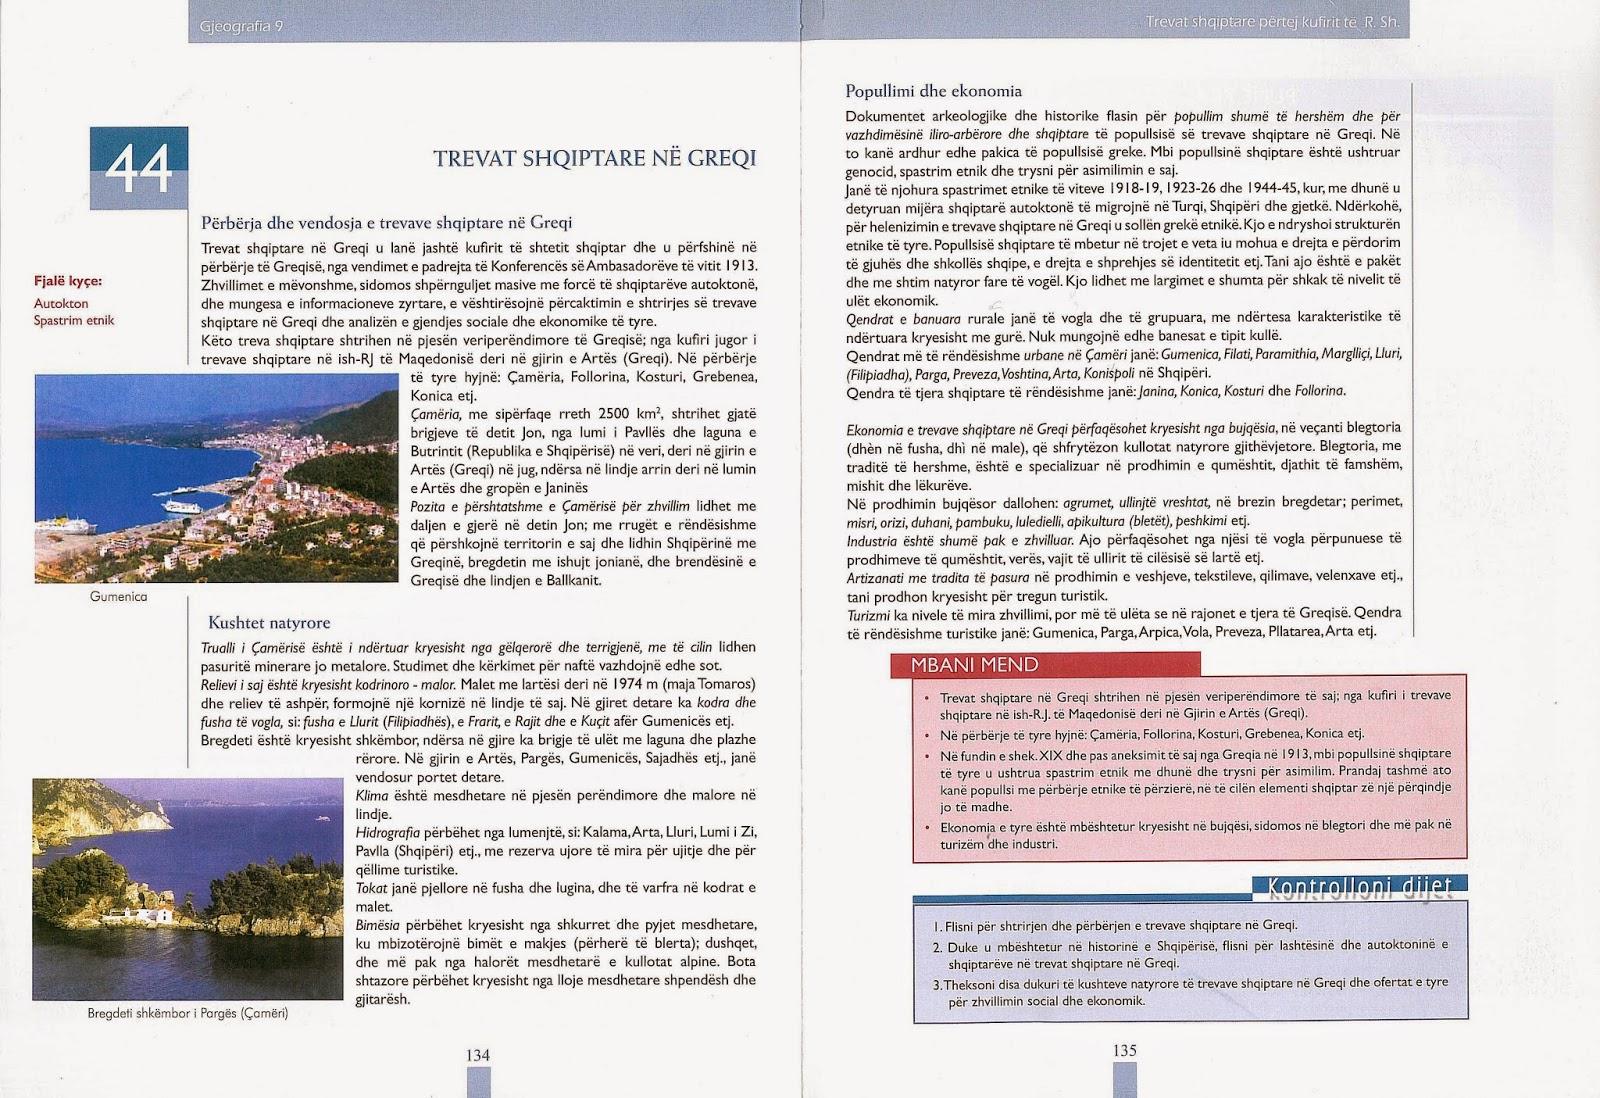 GJEOGRAFIA 9 σελ 134-135